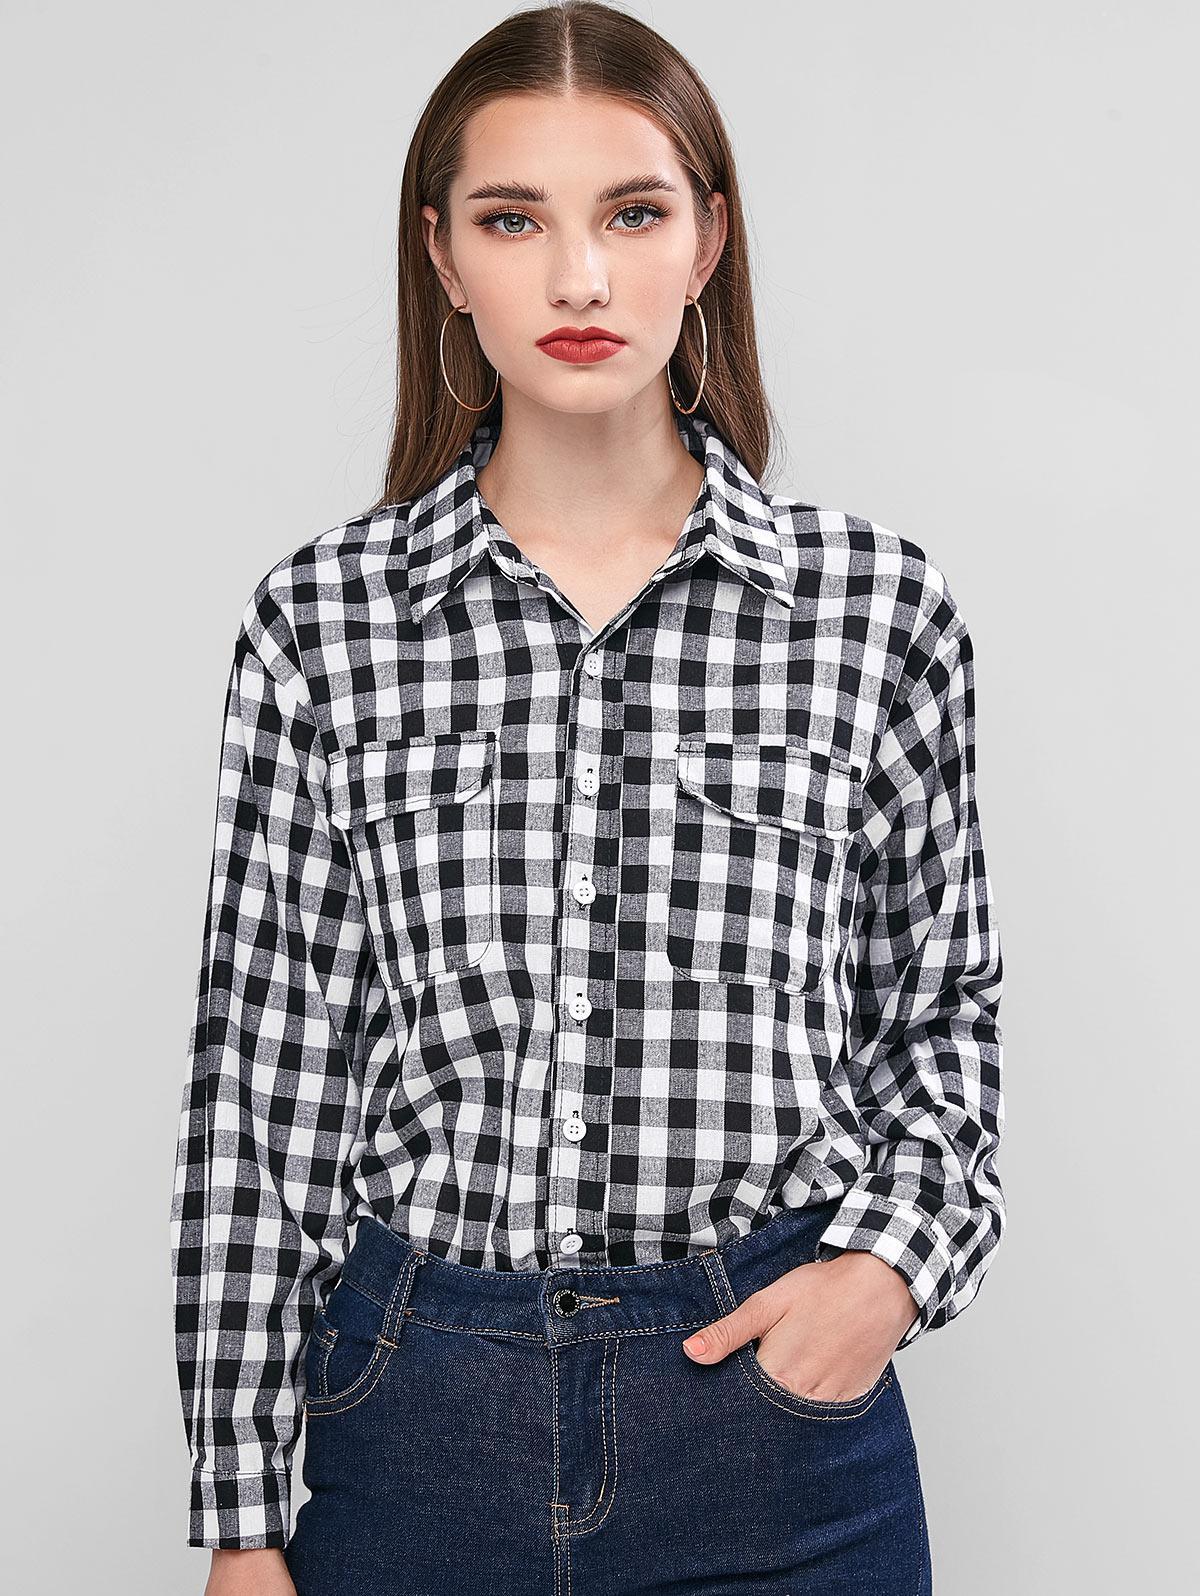 Plaid Button Up Chest Pocket Shirt